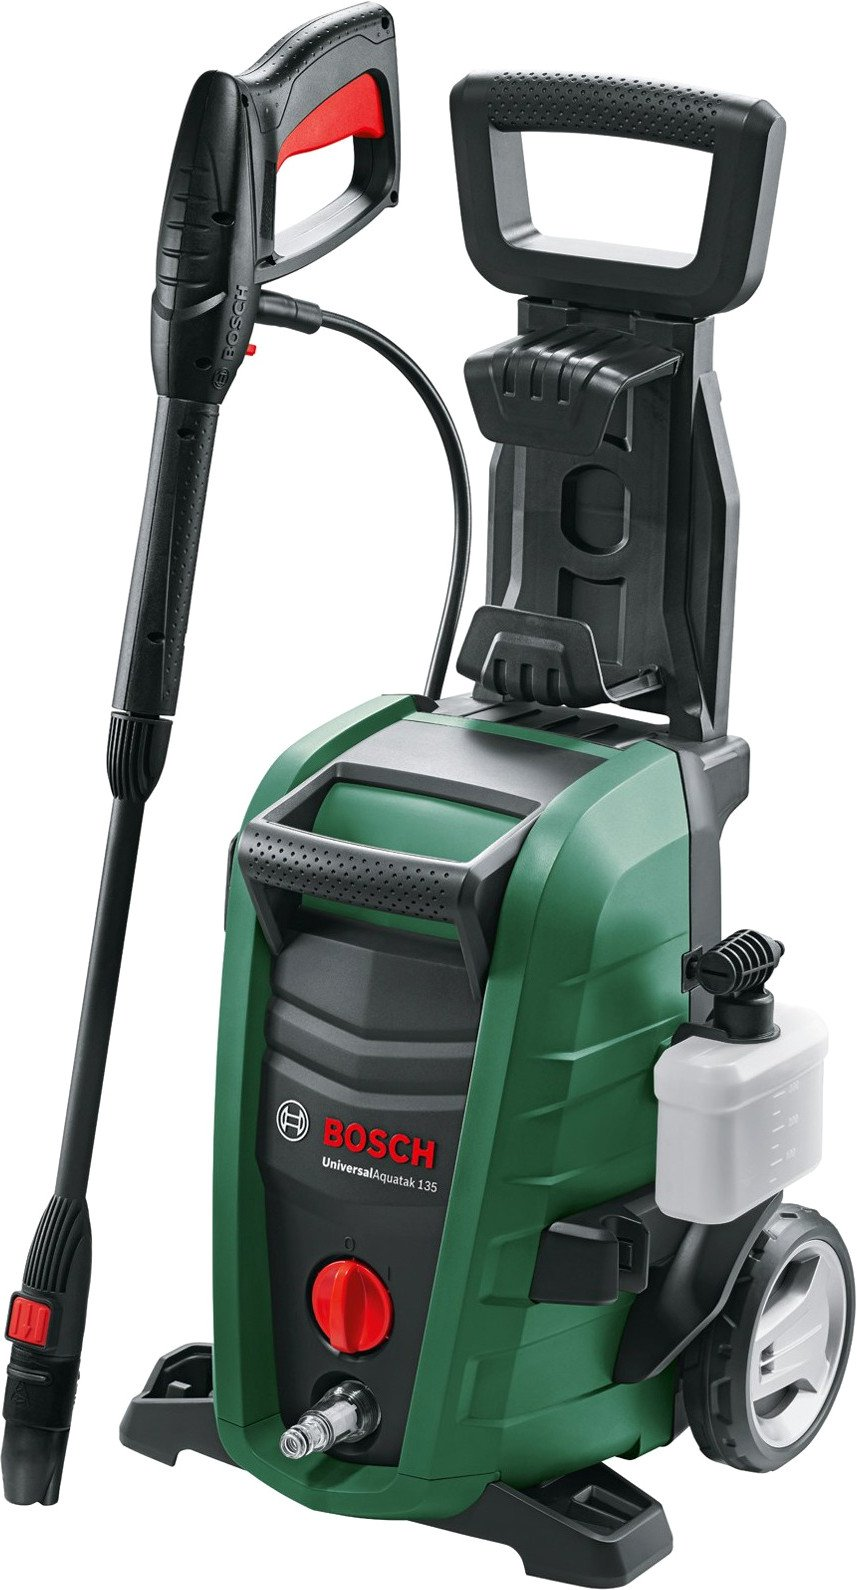 Bosch UniversalAquatak 135 06008A7C00